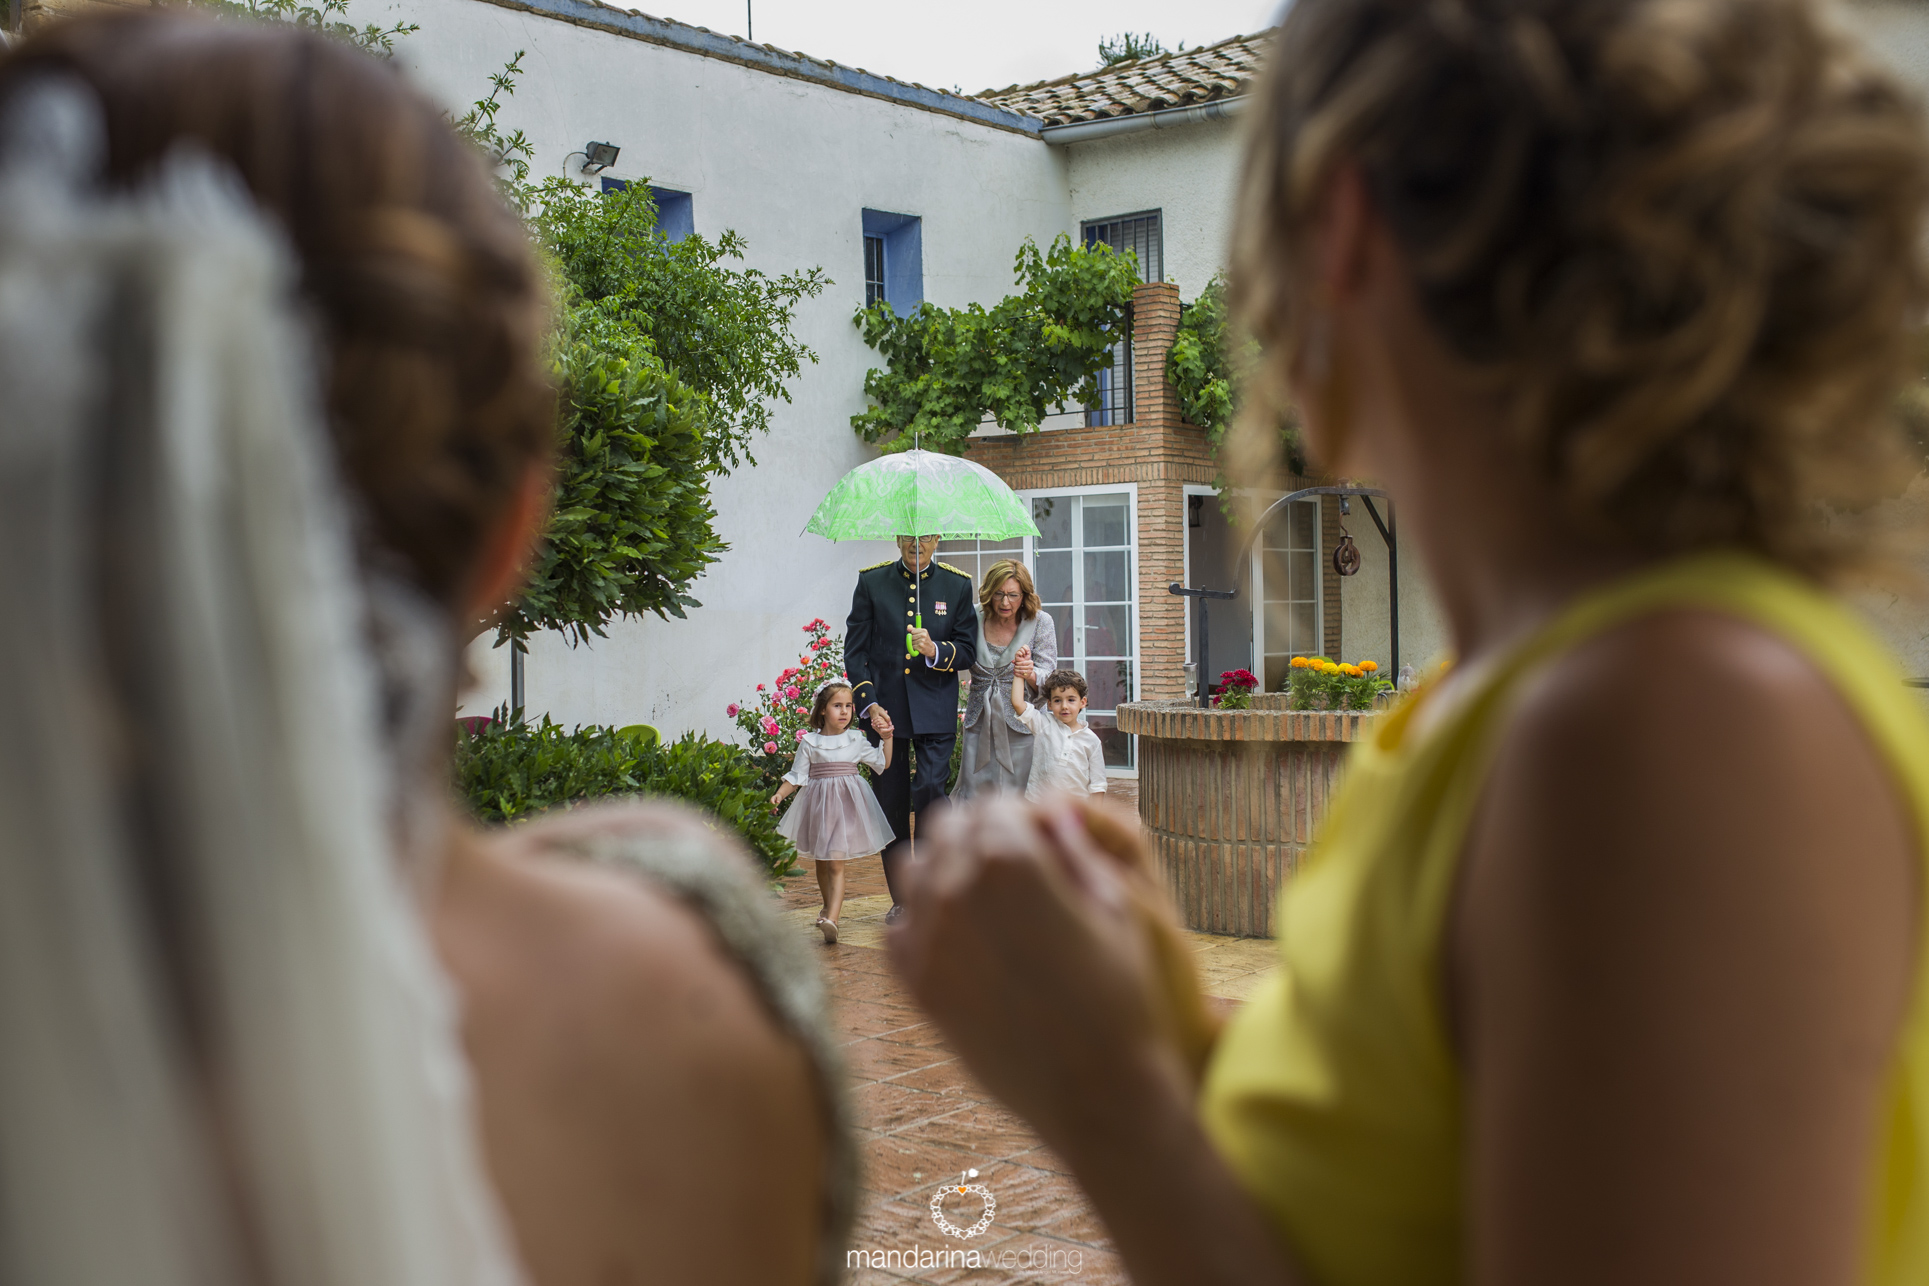 mandarina wedding, fotografo boda pais vasco, fotografo boda zaragoza, fotógrafo boda soria, fotografo boda Madrid, fotógrafo boda tarragona-11